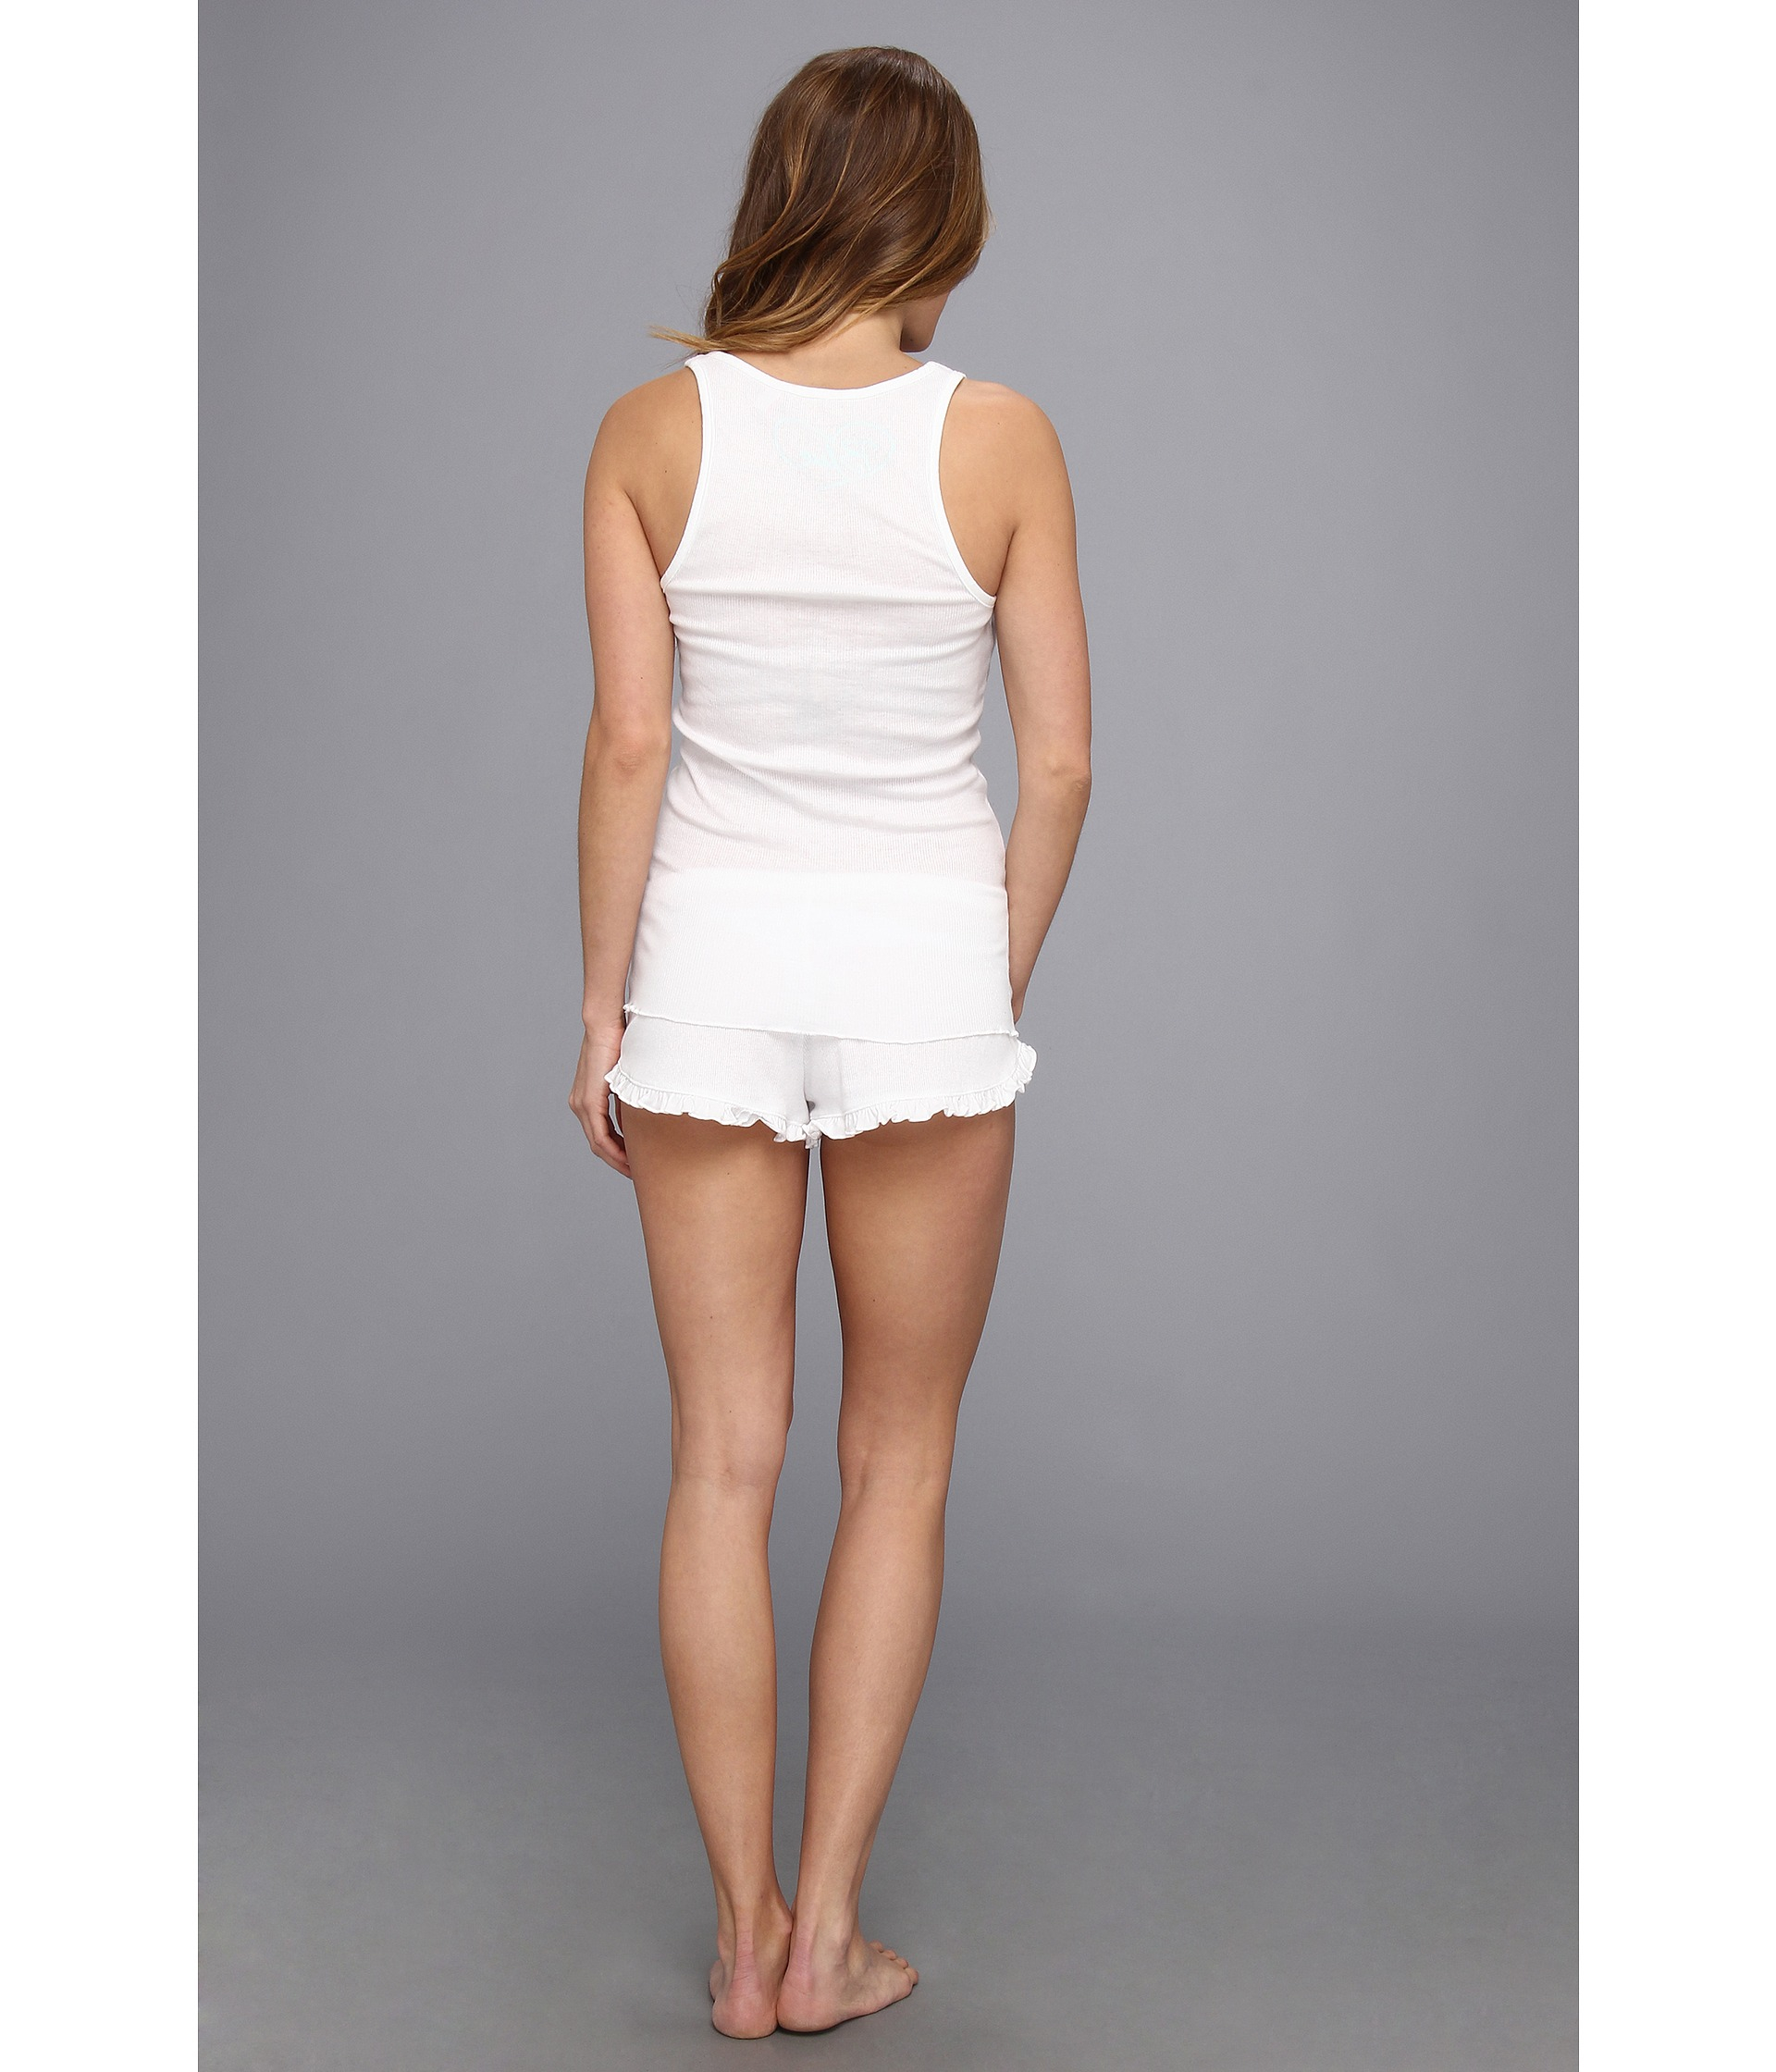 Lyst - Betsey Johnson Bridal Wifeybachelorette Short Set in White